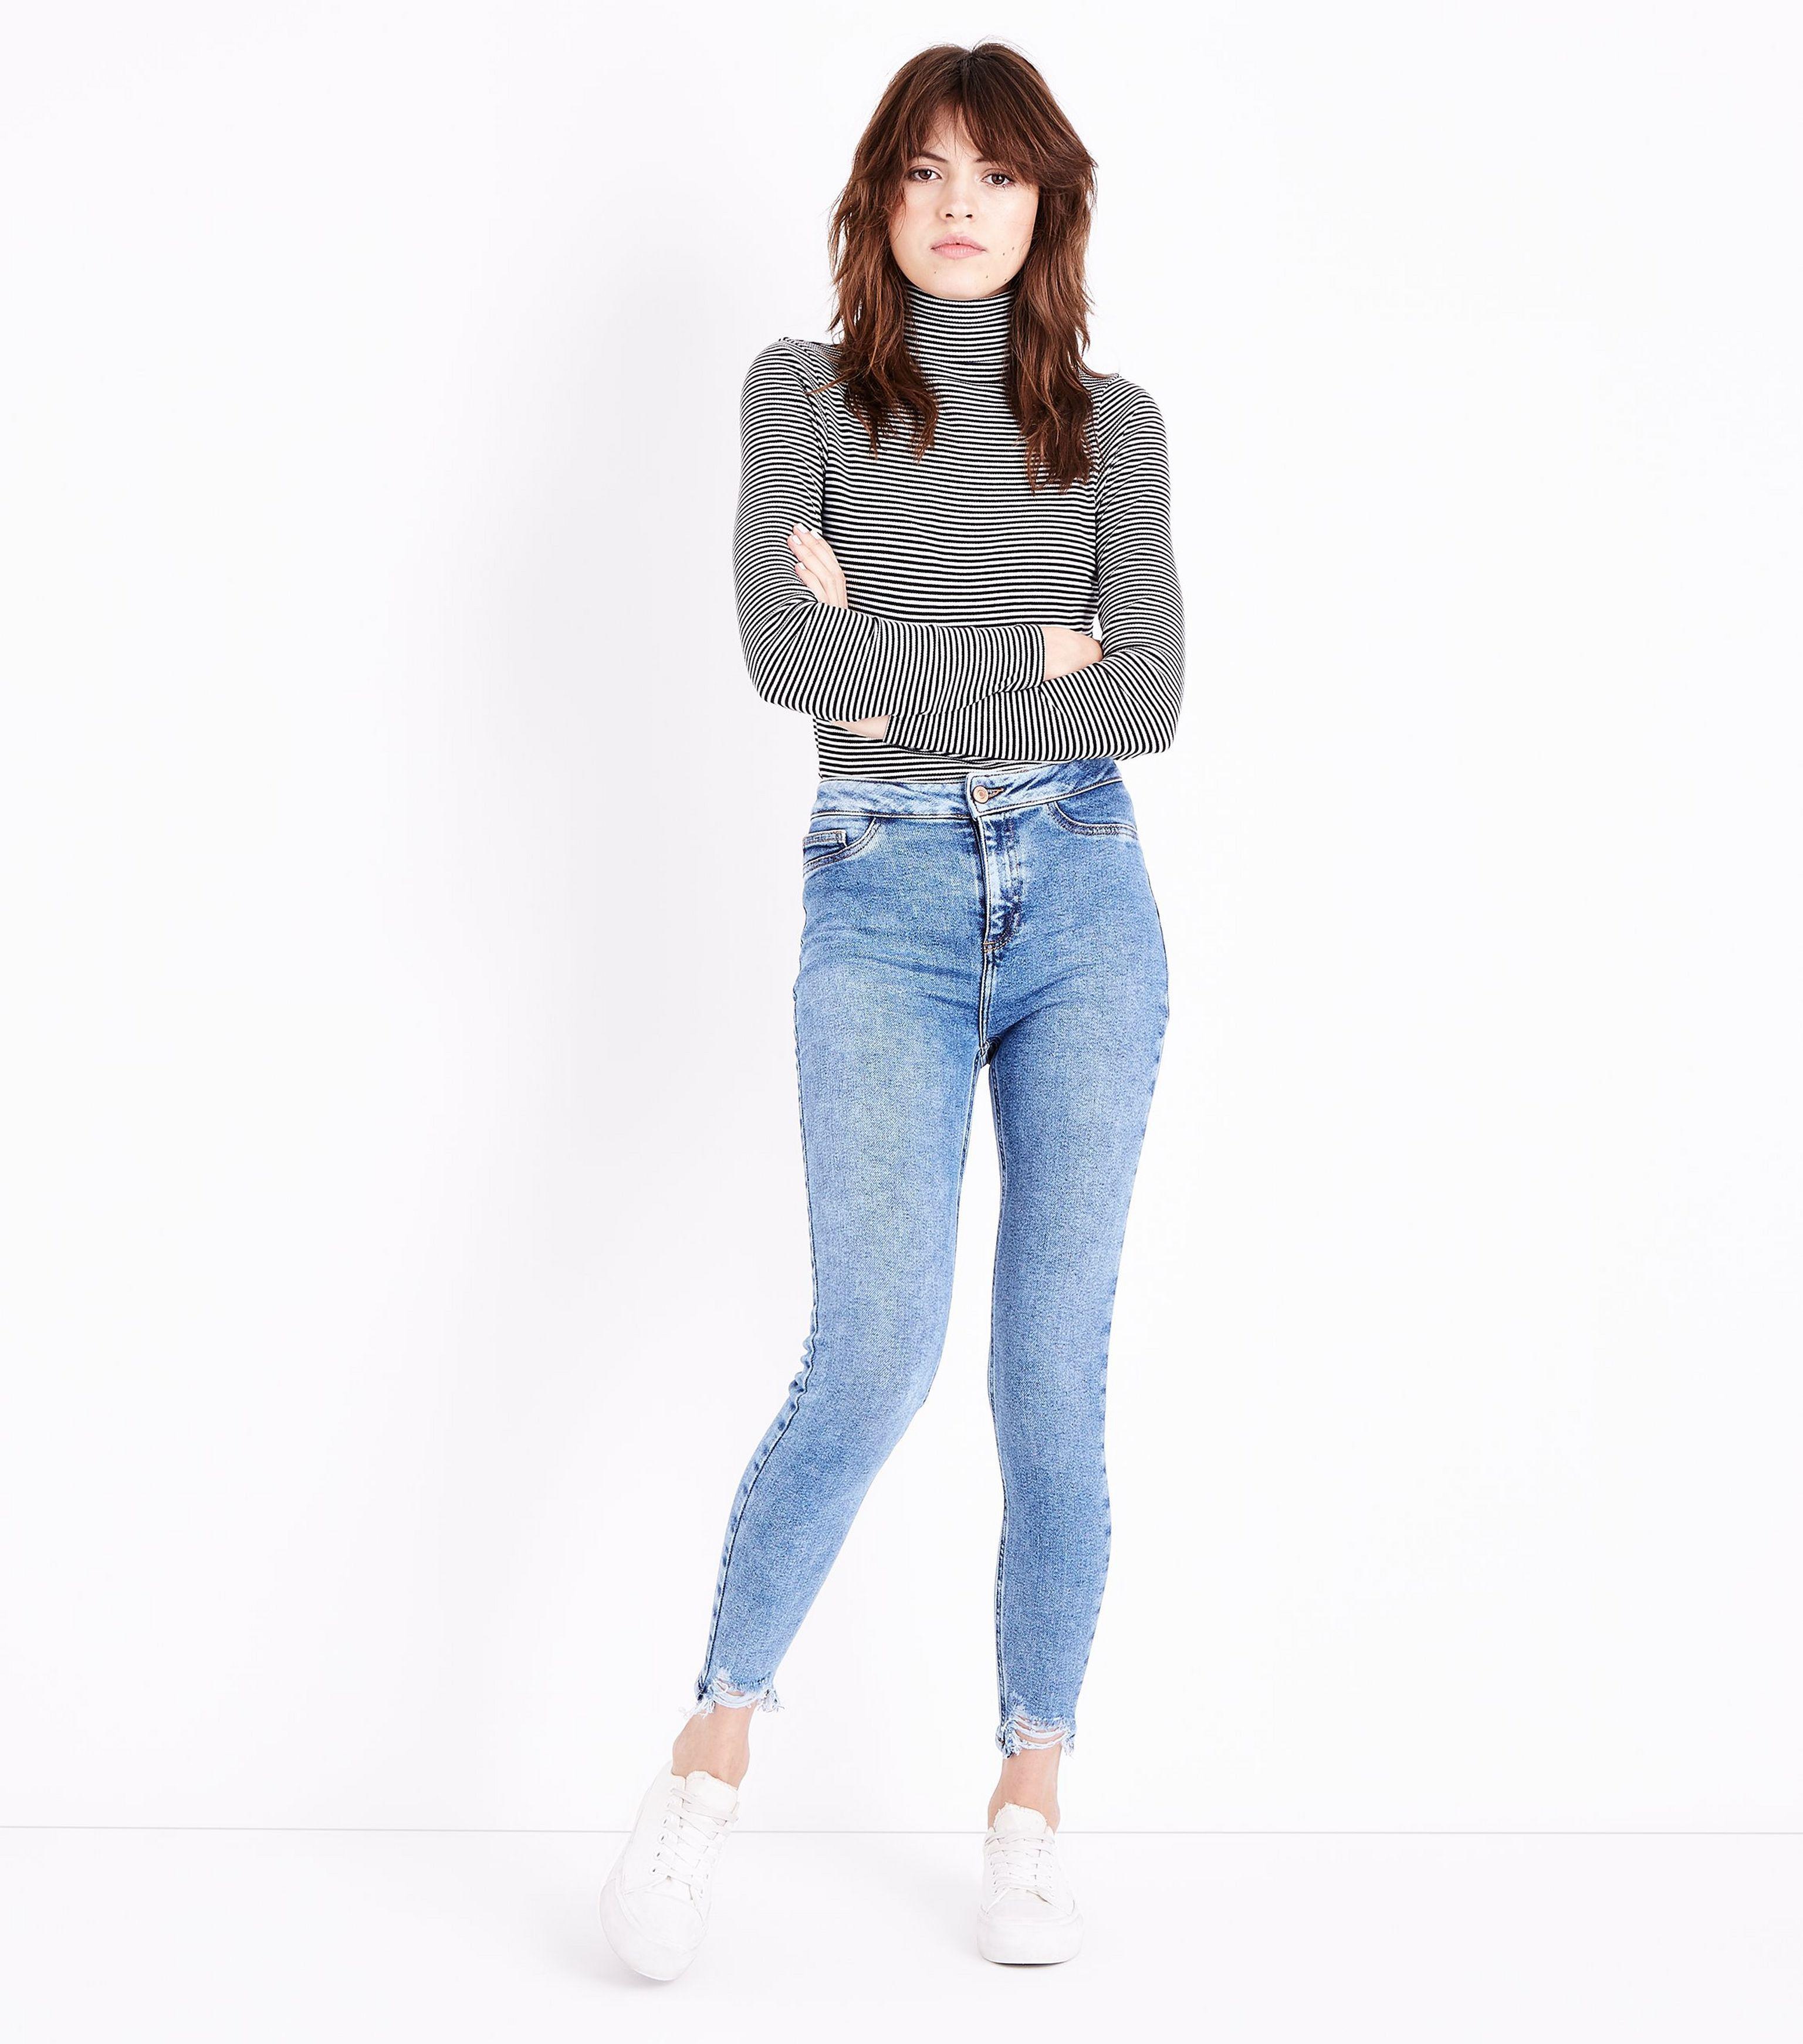 b3bc2bd950527 New Look Blue Fray Hem High Waist Super Skinny Hallie Jeans in Blue ...